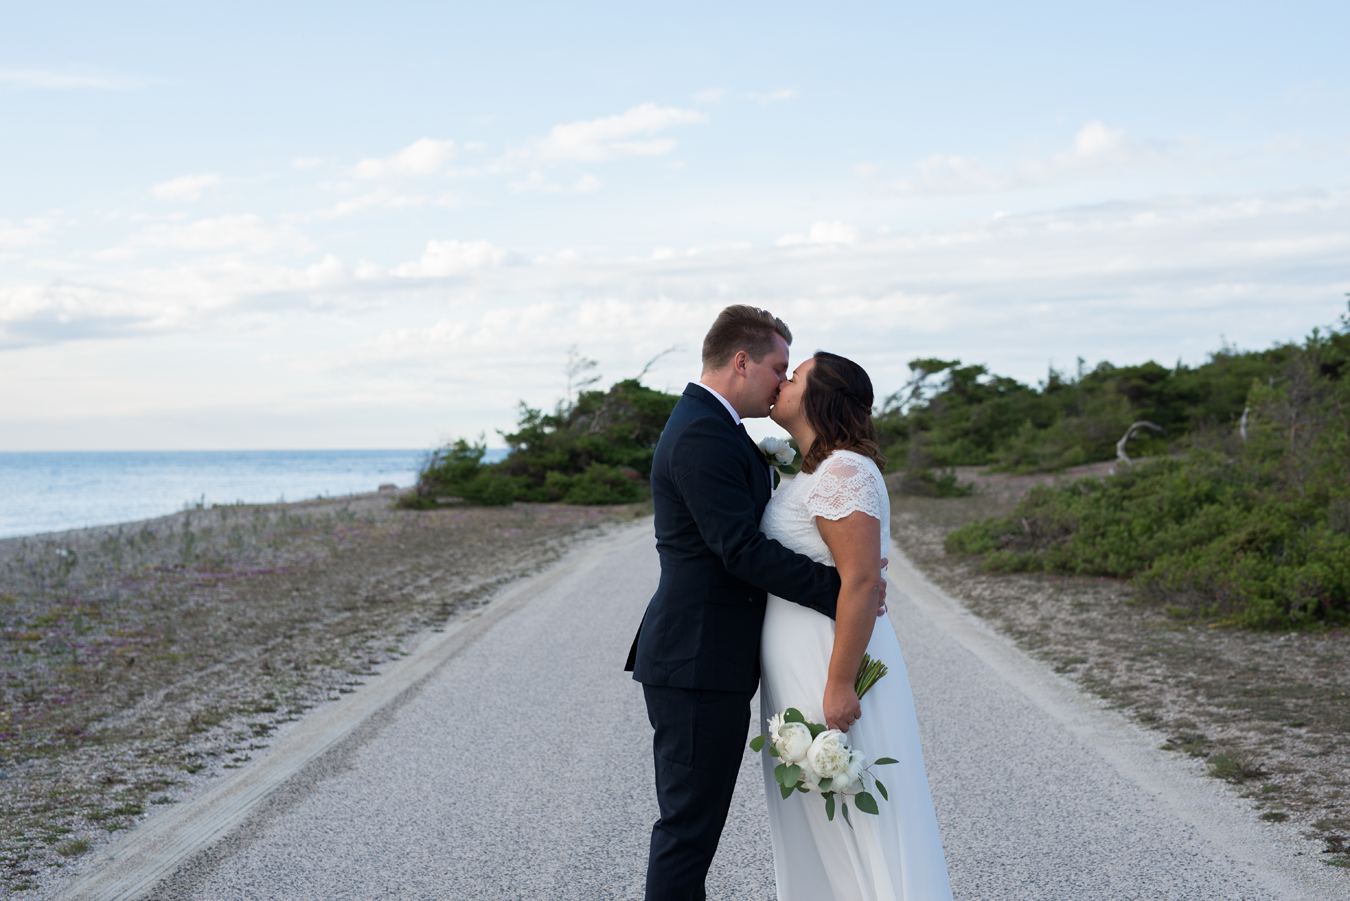 098-bröllopsfotograf-gotland-ekstakusten-neas-fotografi.jpg